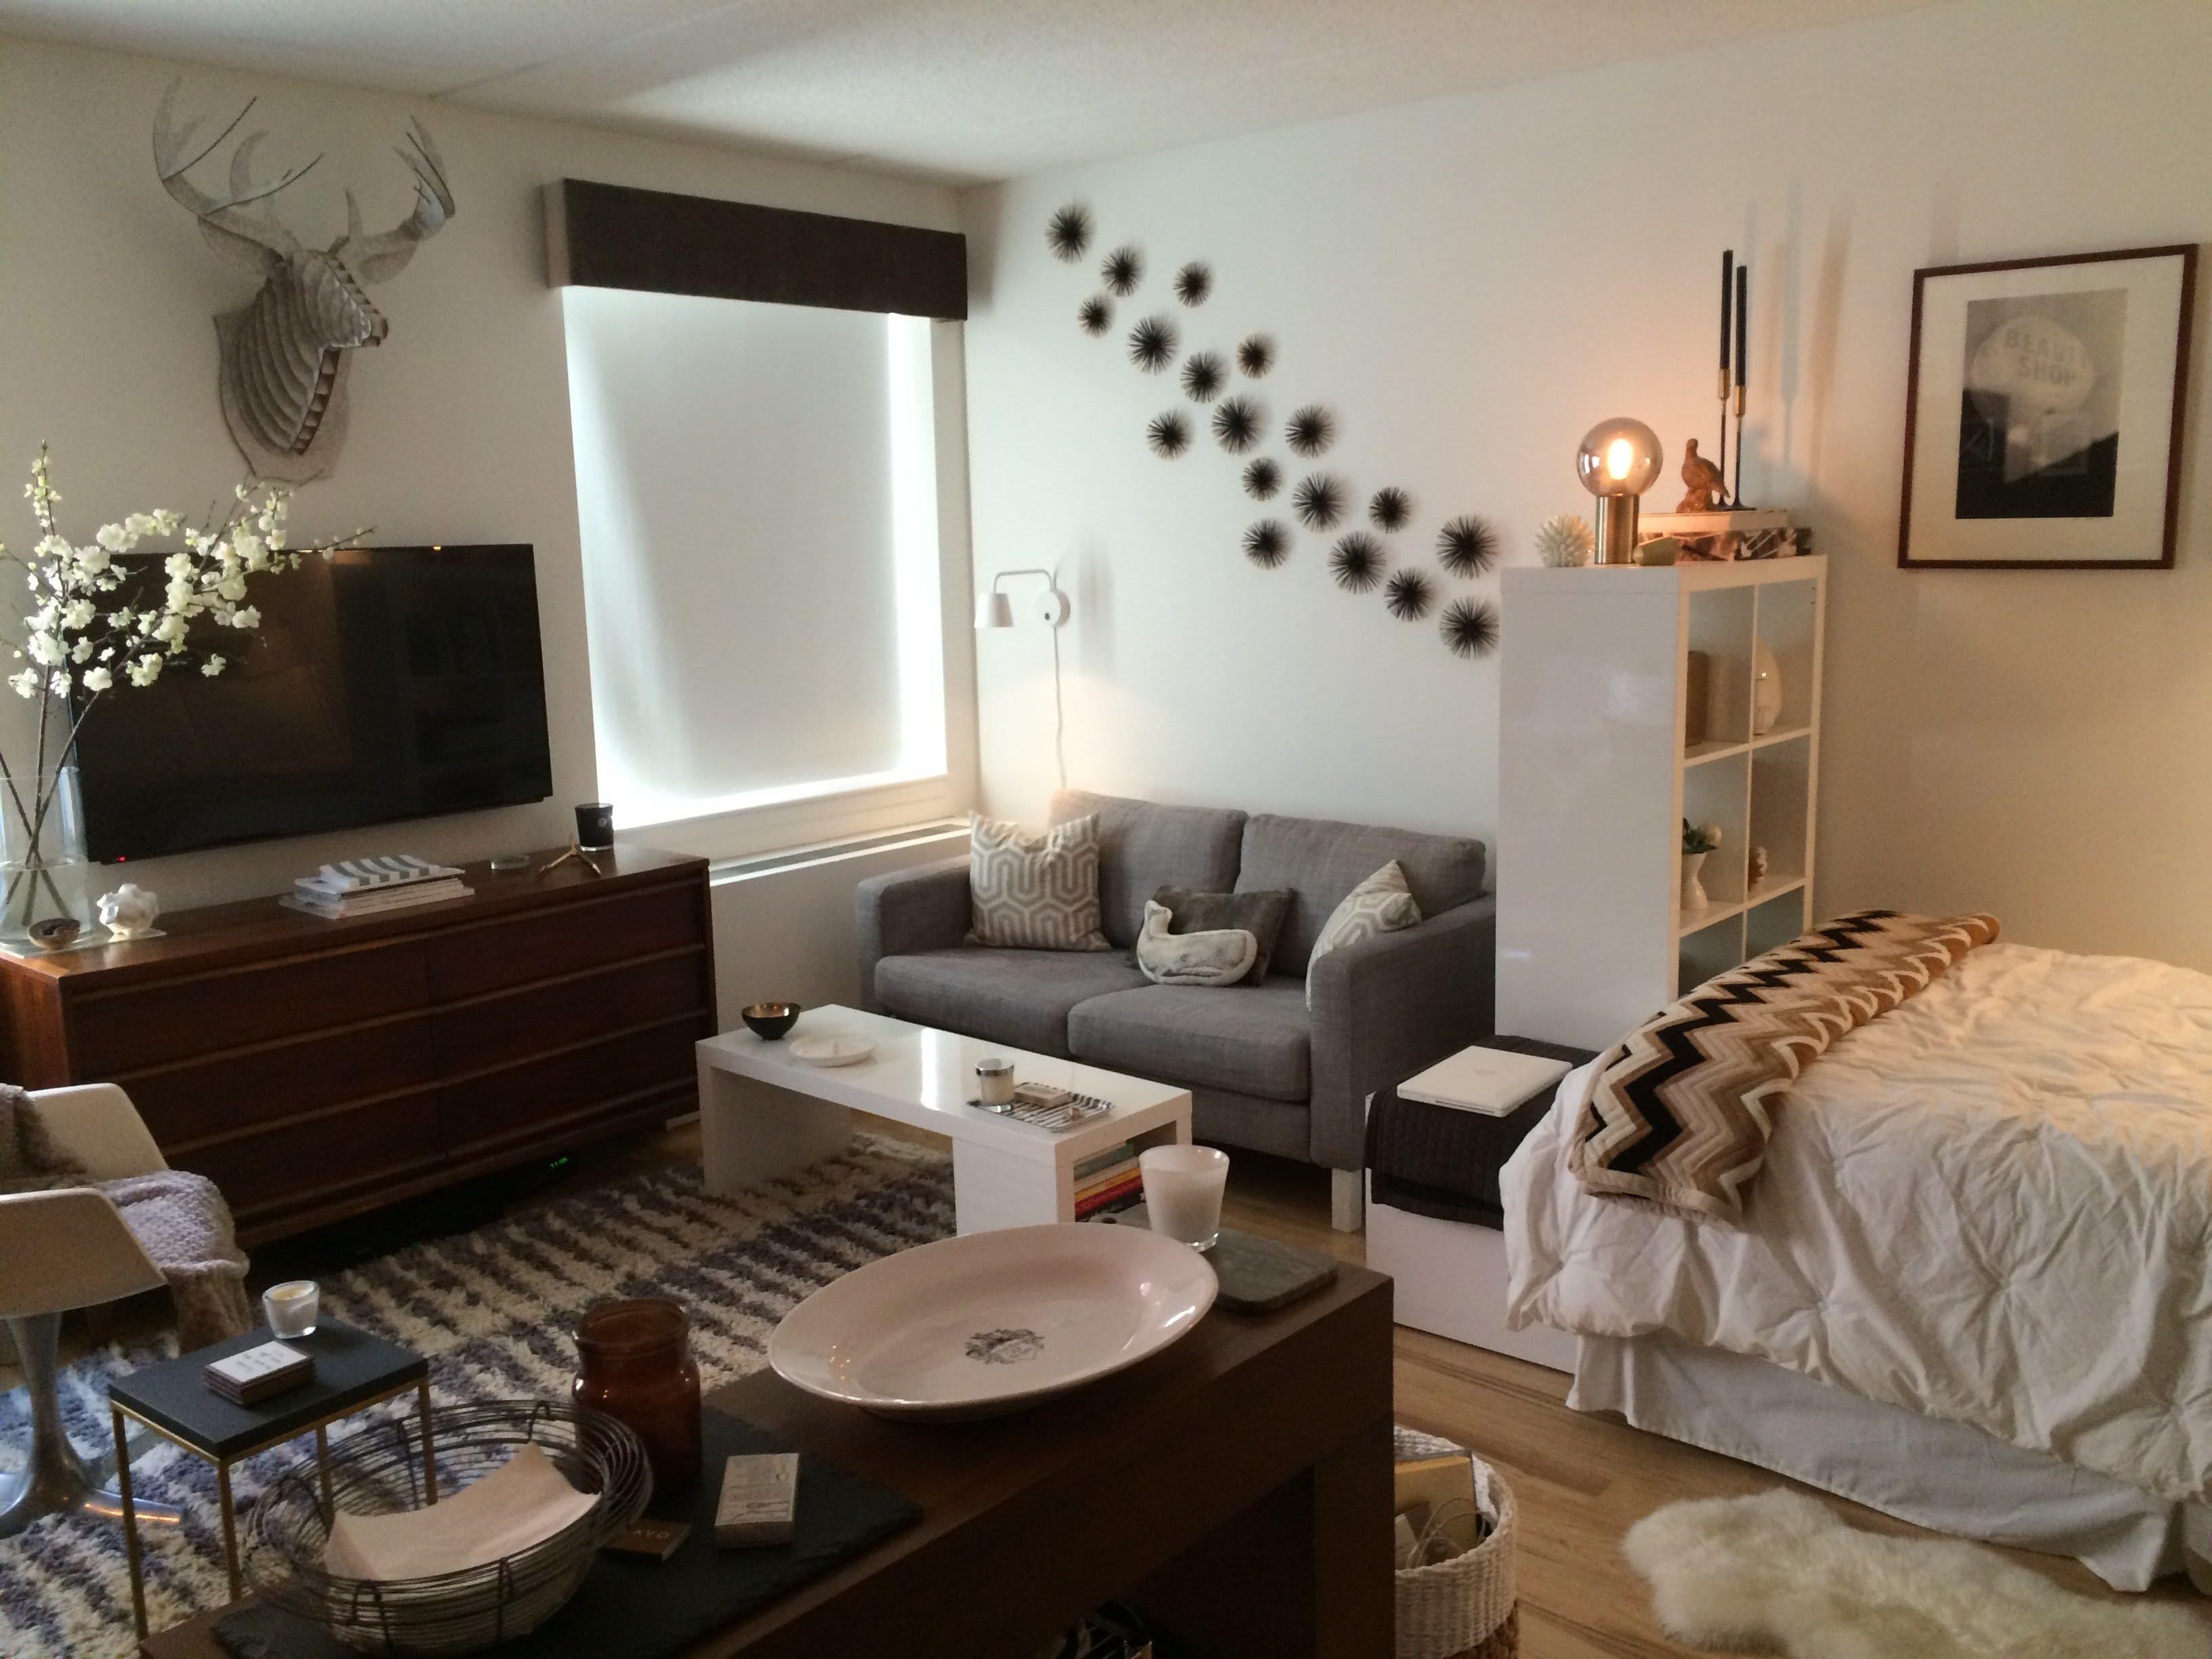 5 Studio Apartment Layouts that Work  Studio apartment